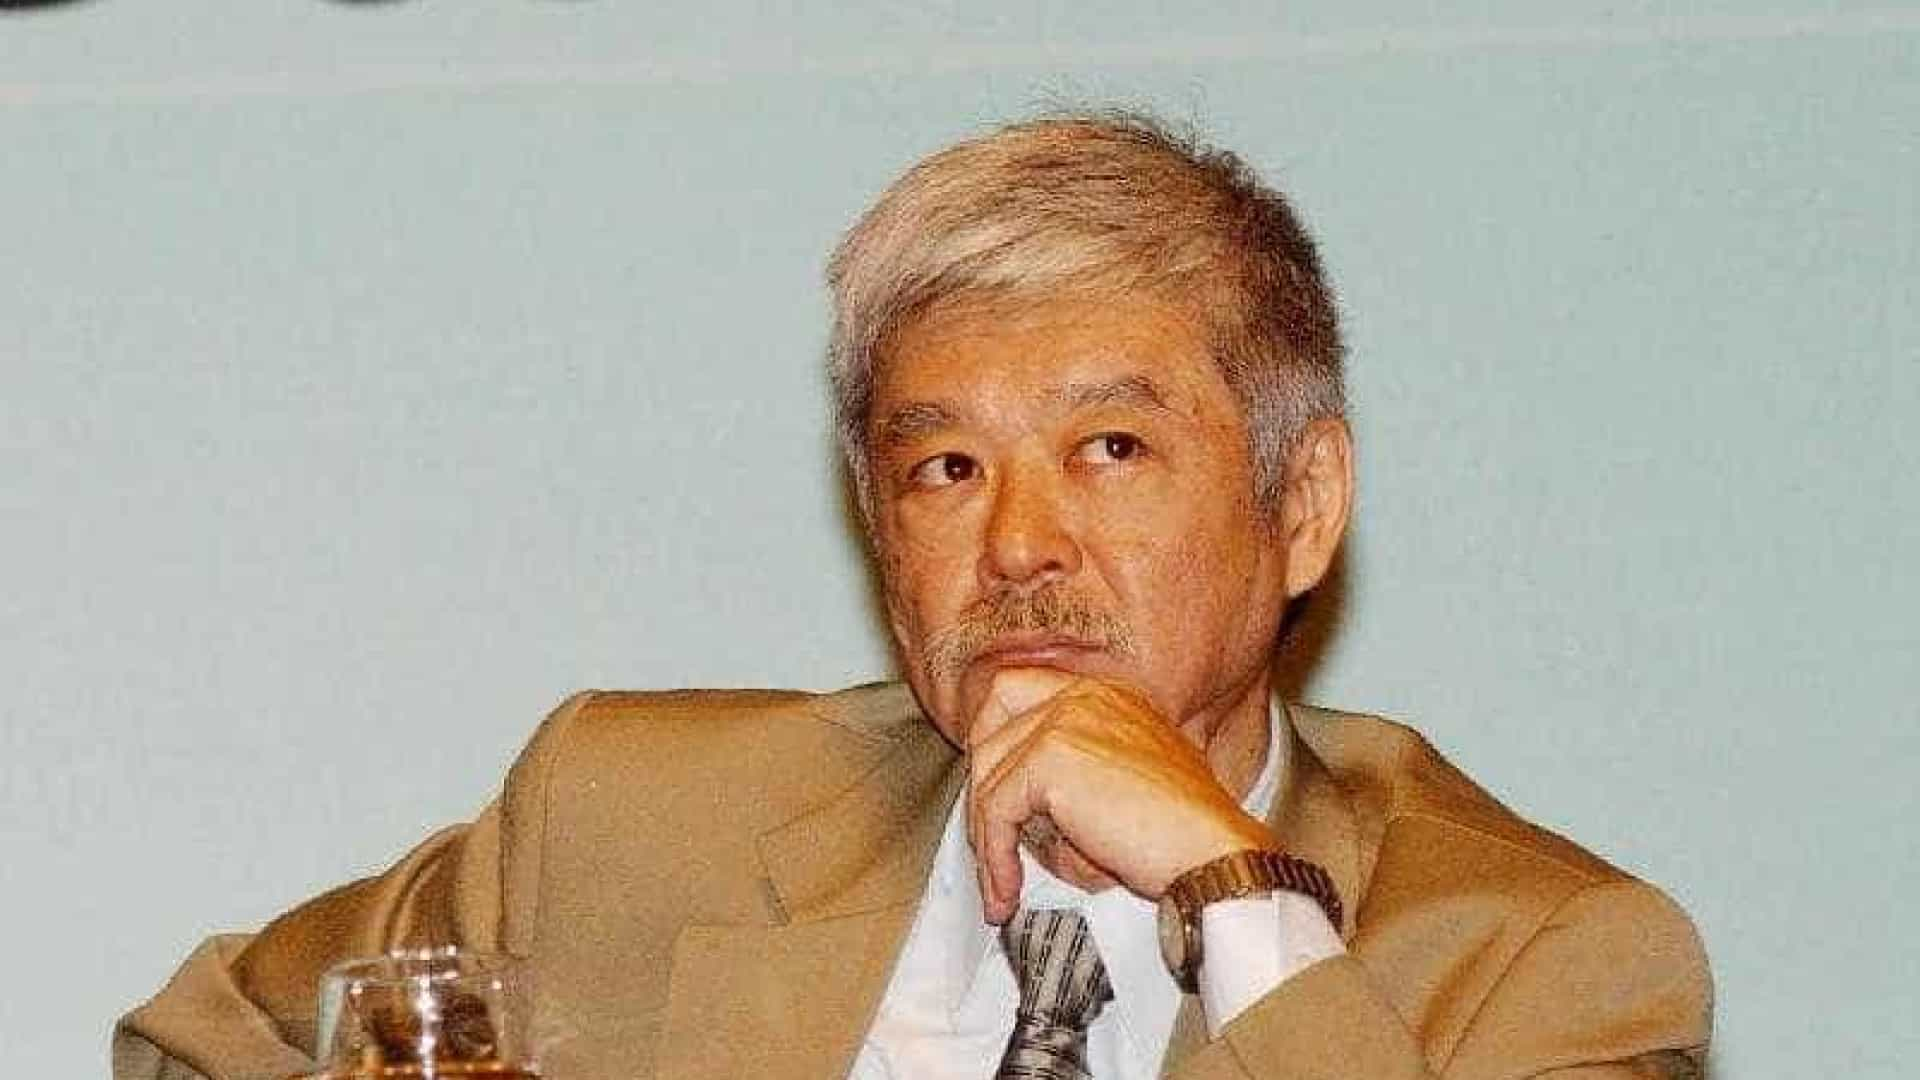 STJ condena 'Veja' a indenizar família do ex-ministro Luiz Gushiken